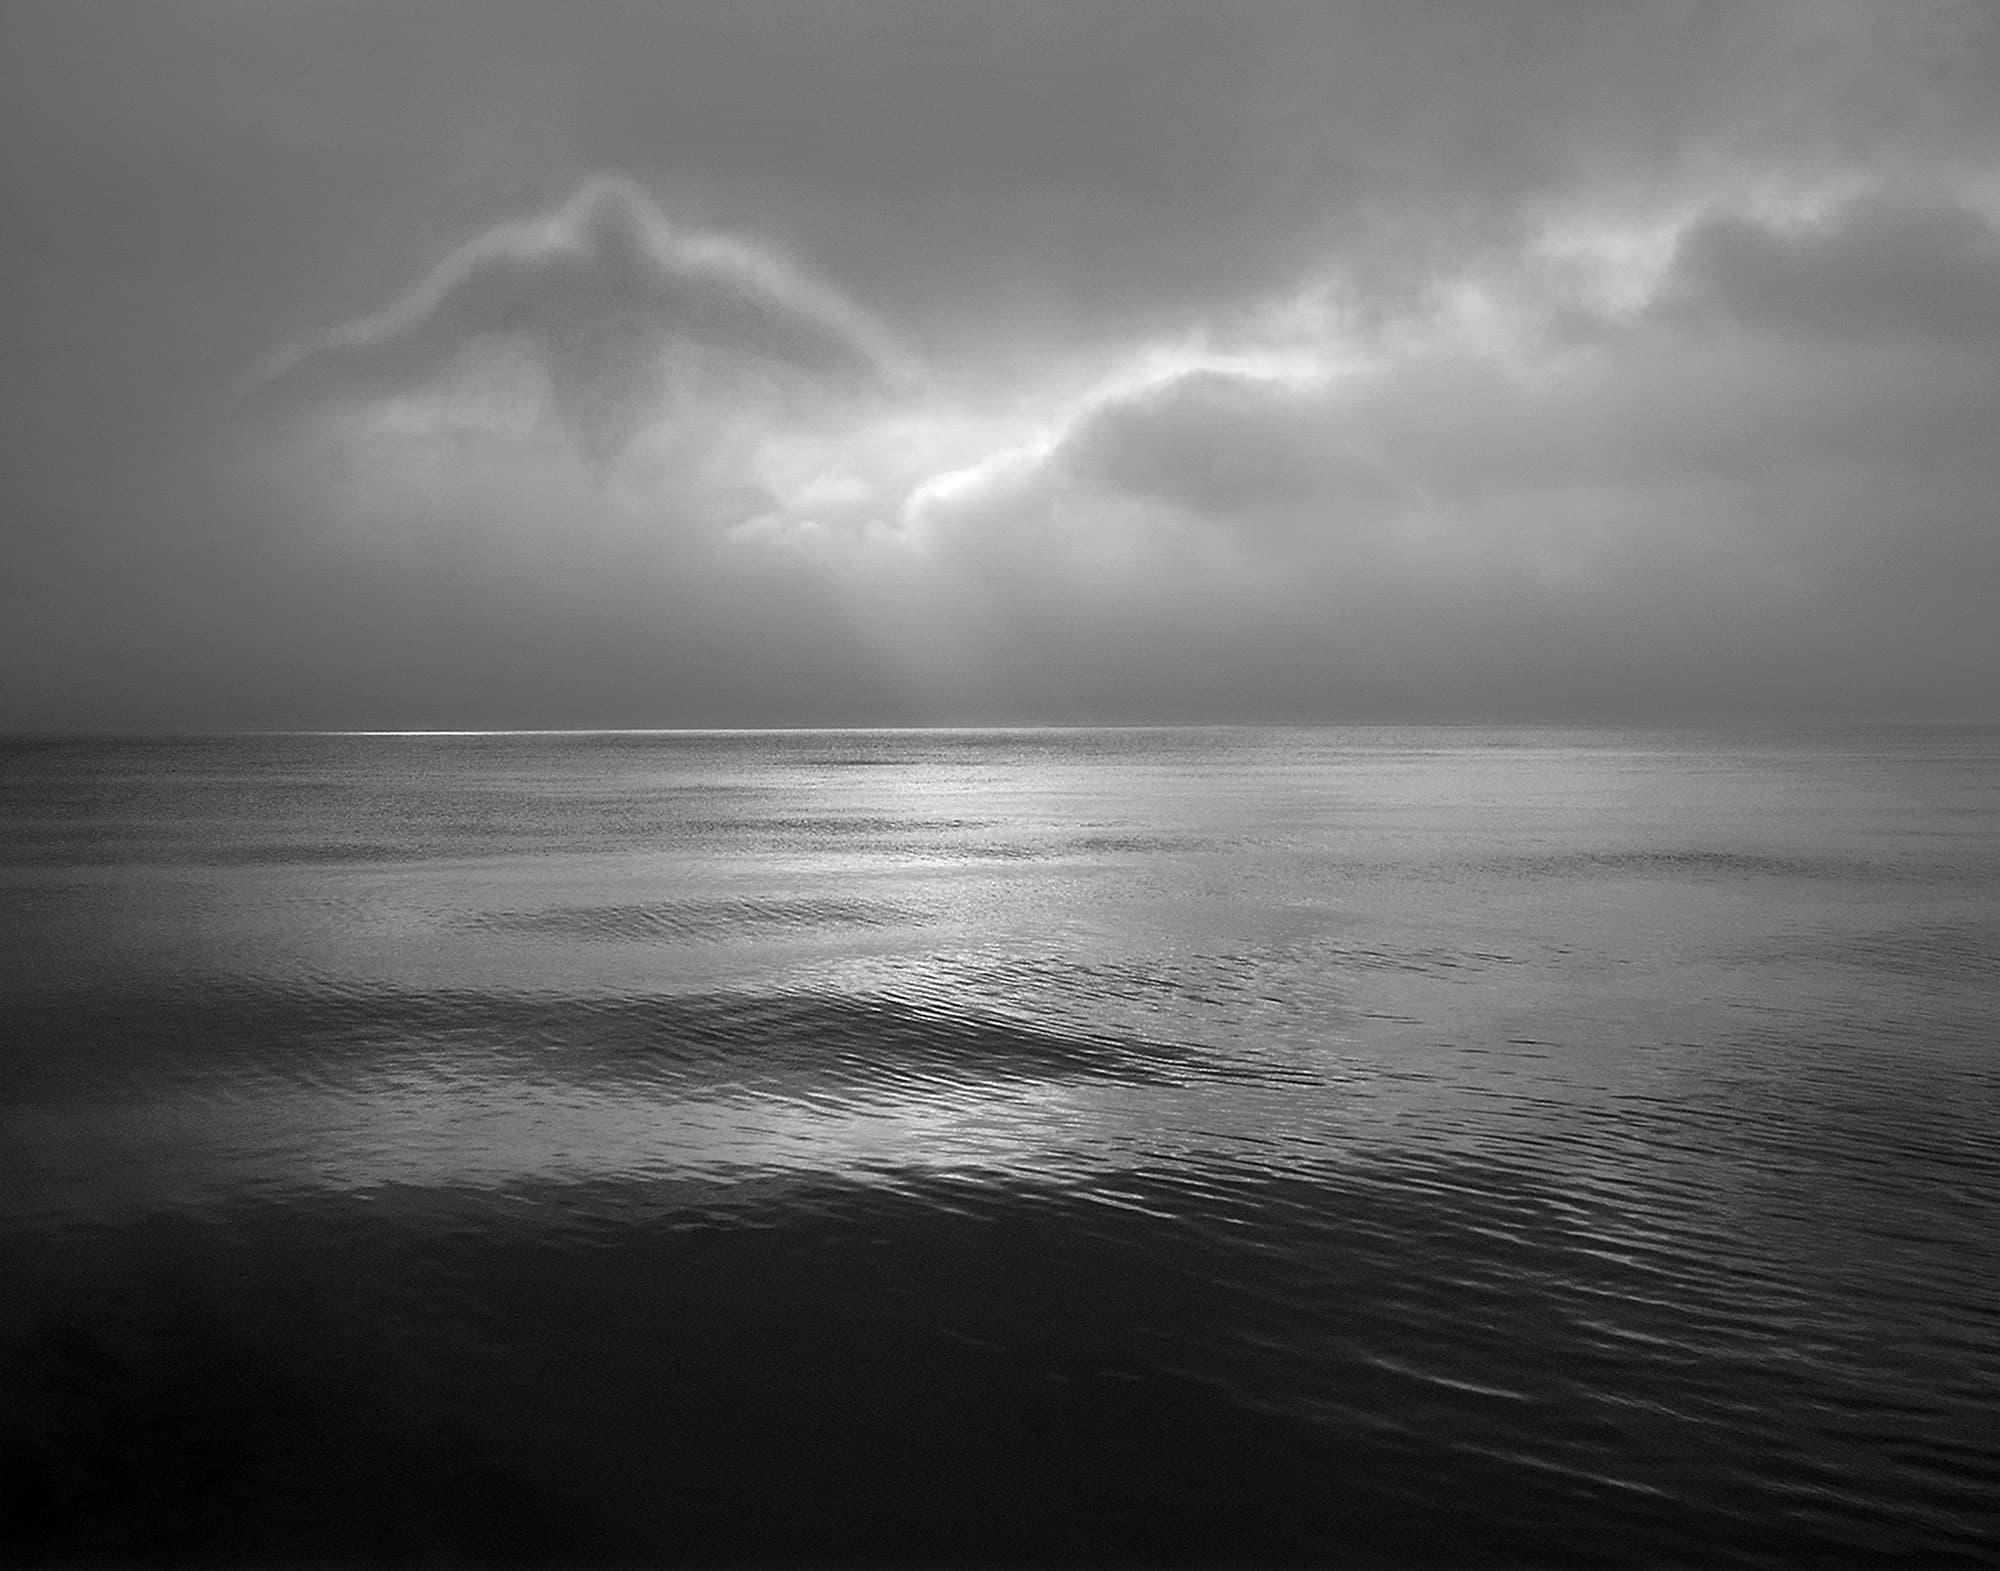 arthur-lazar-Lake-Michigan-2004